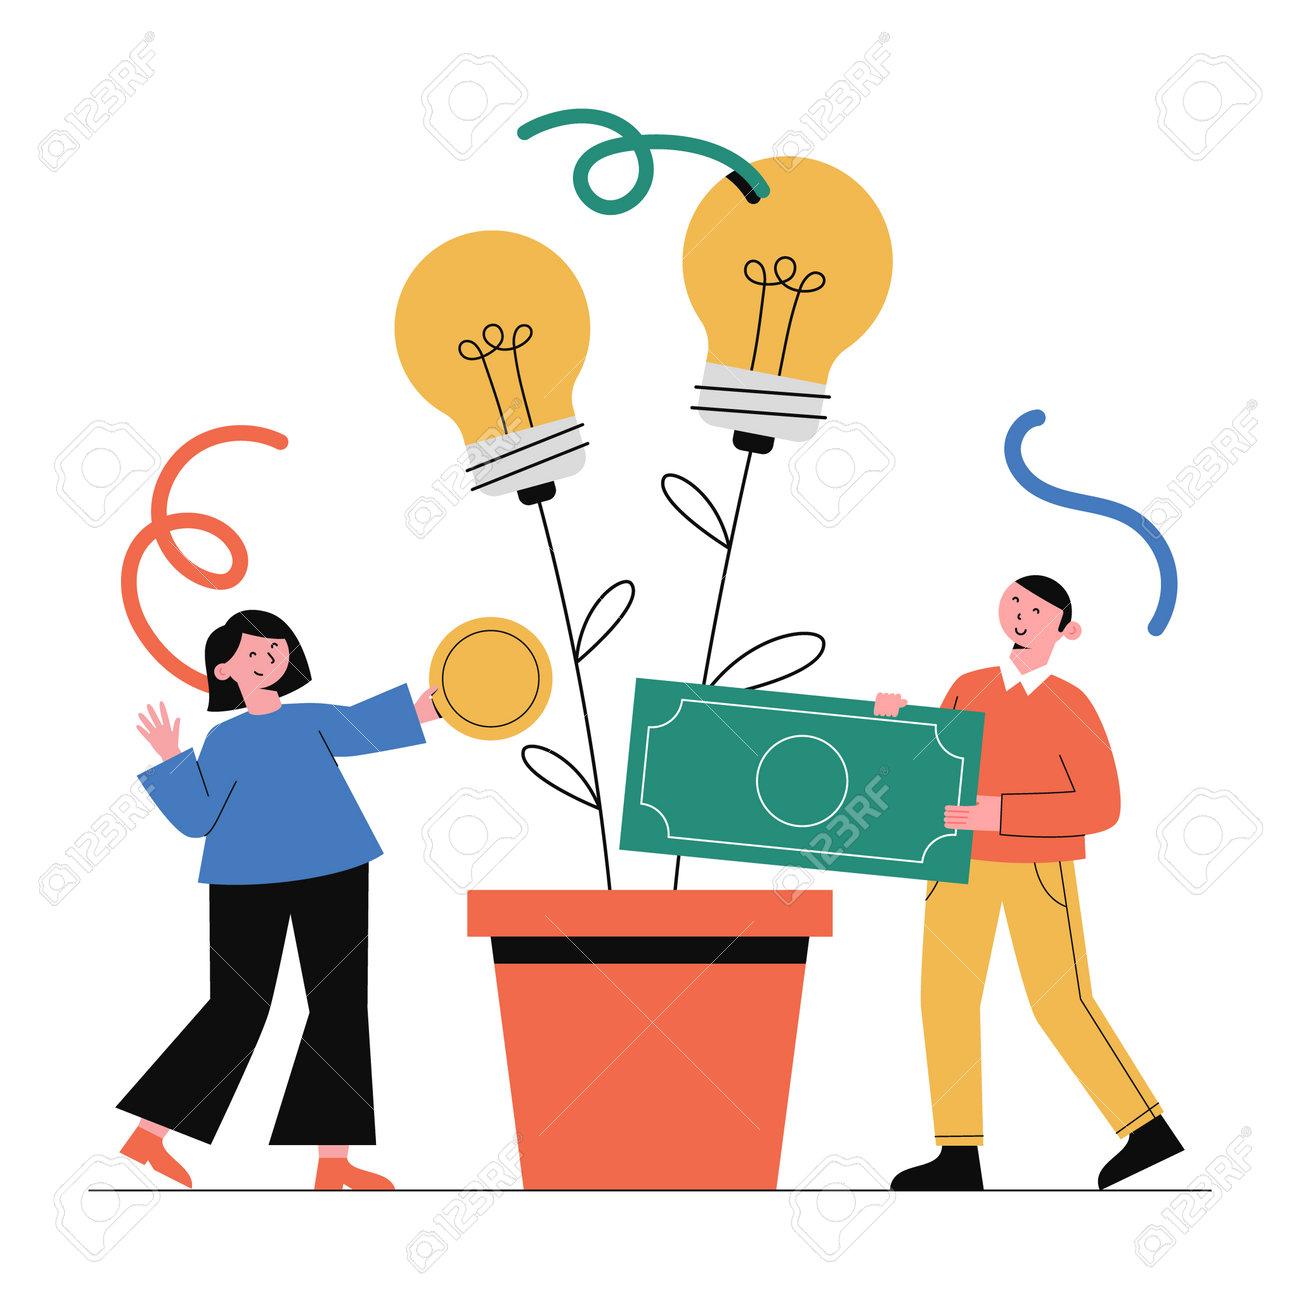 Business concept vector illustration. - 162421405